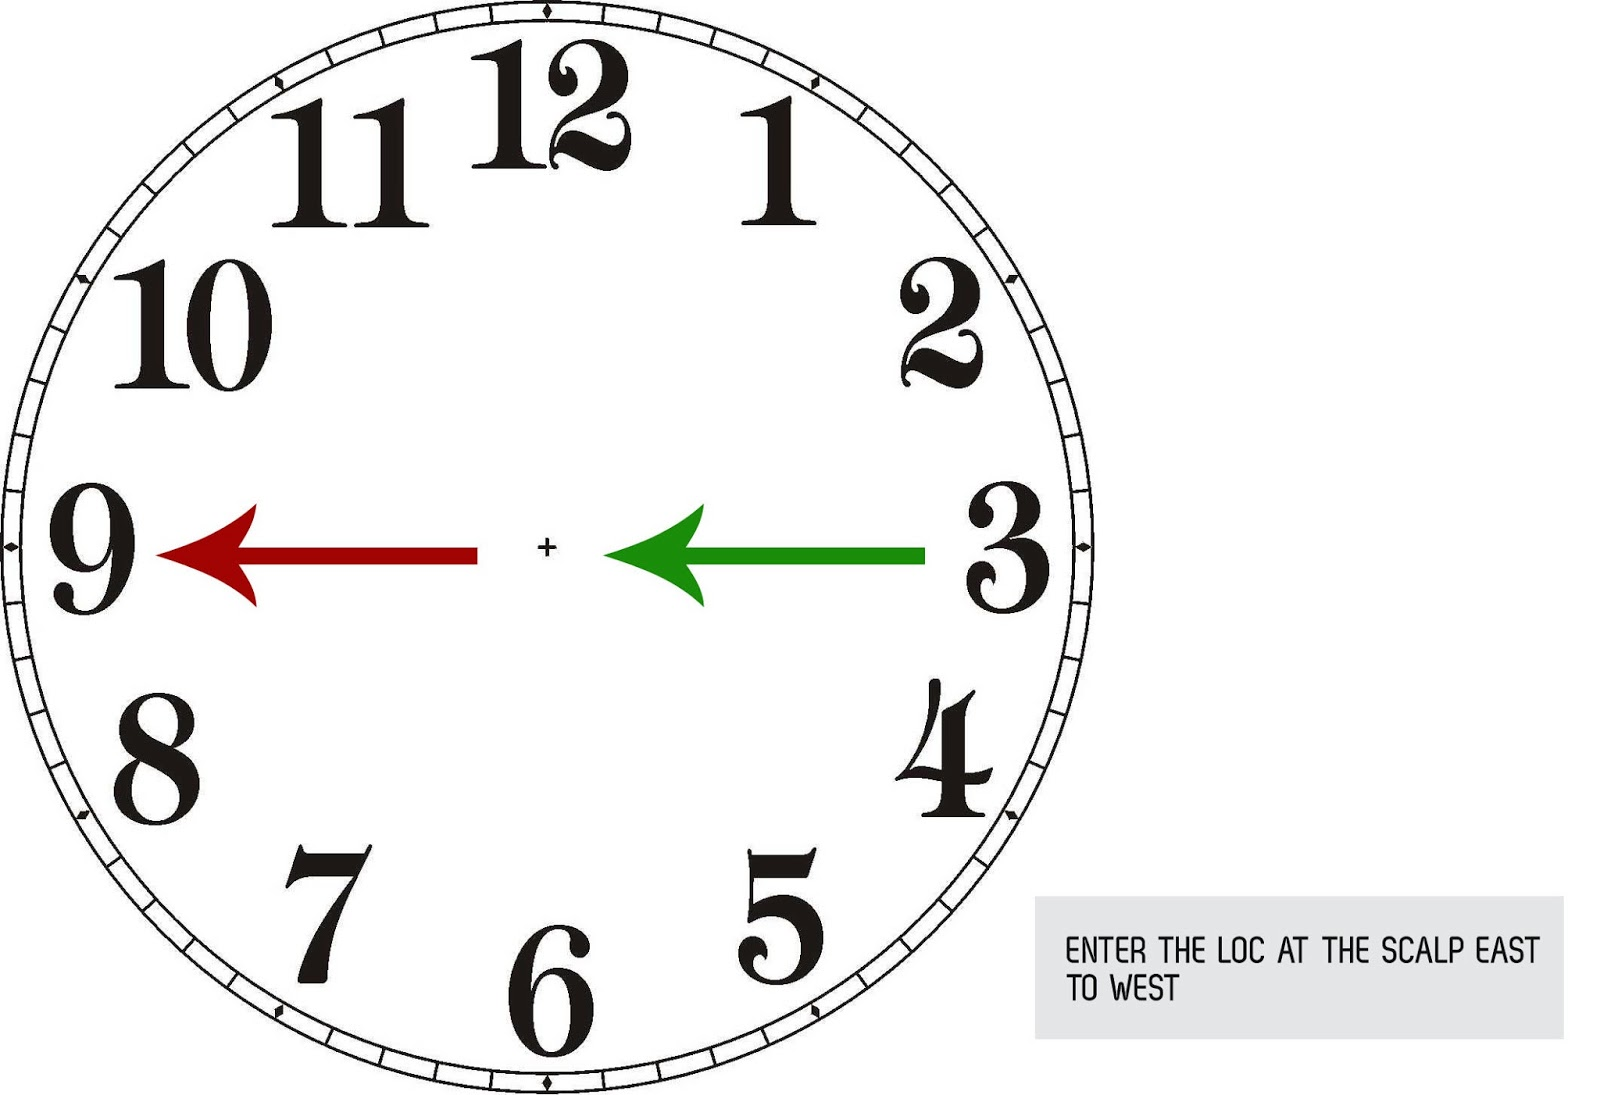 diagram of clock 12 3 6 9